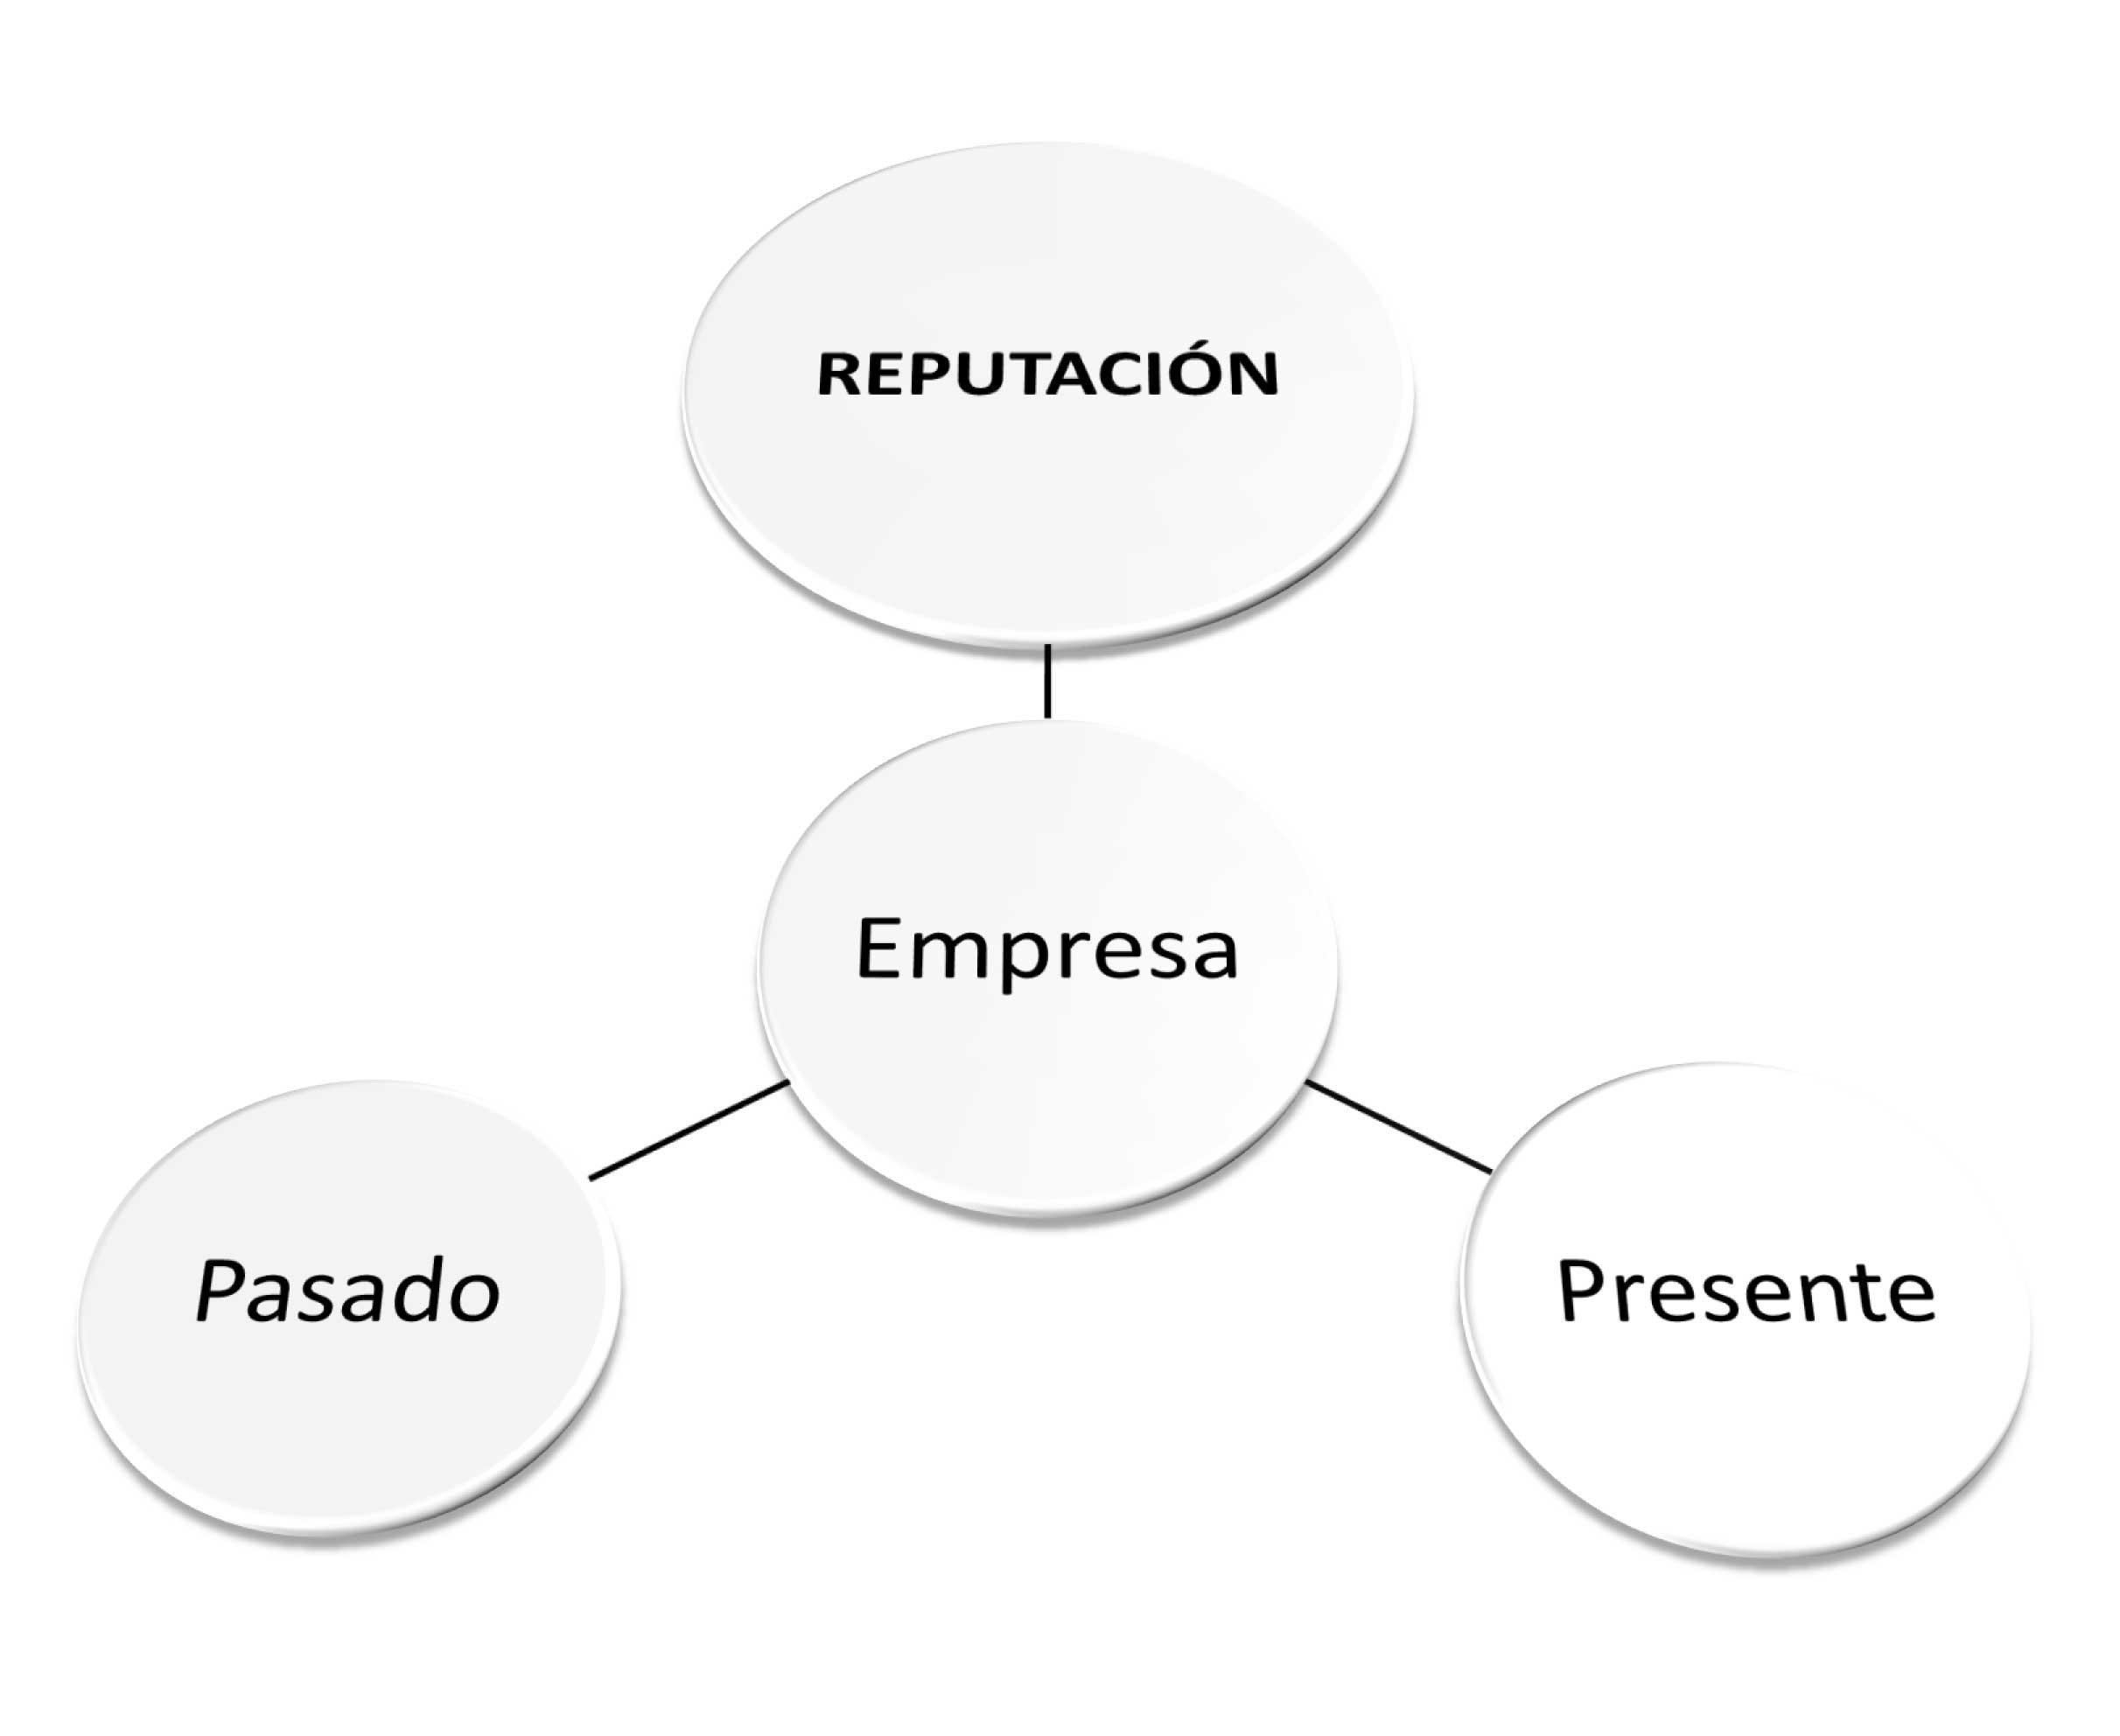 grafico-reputacion